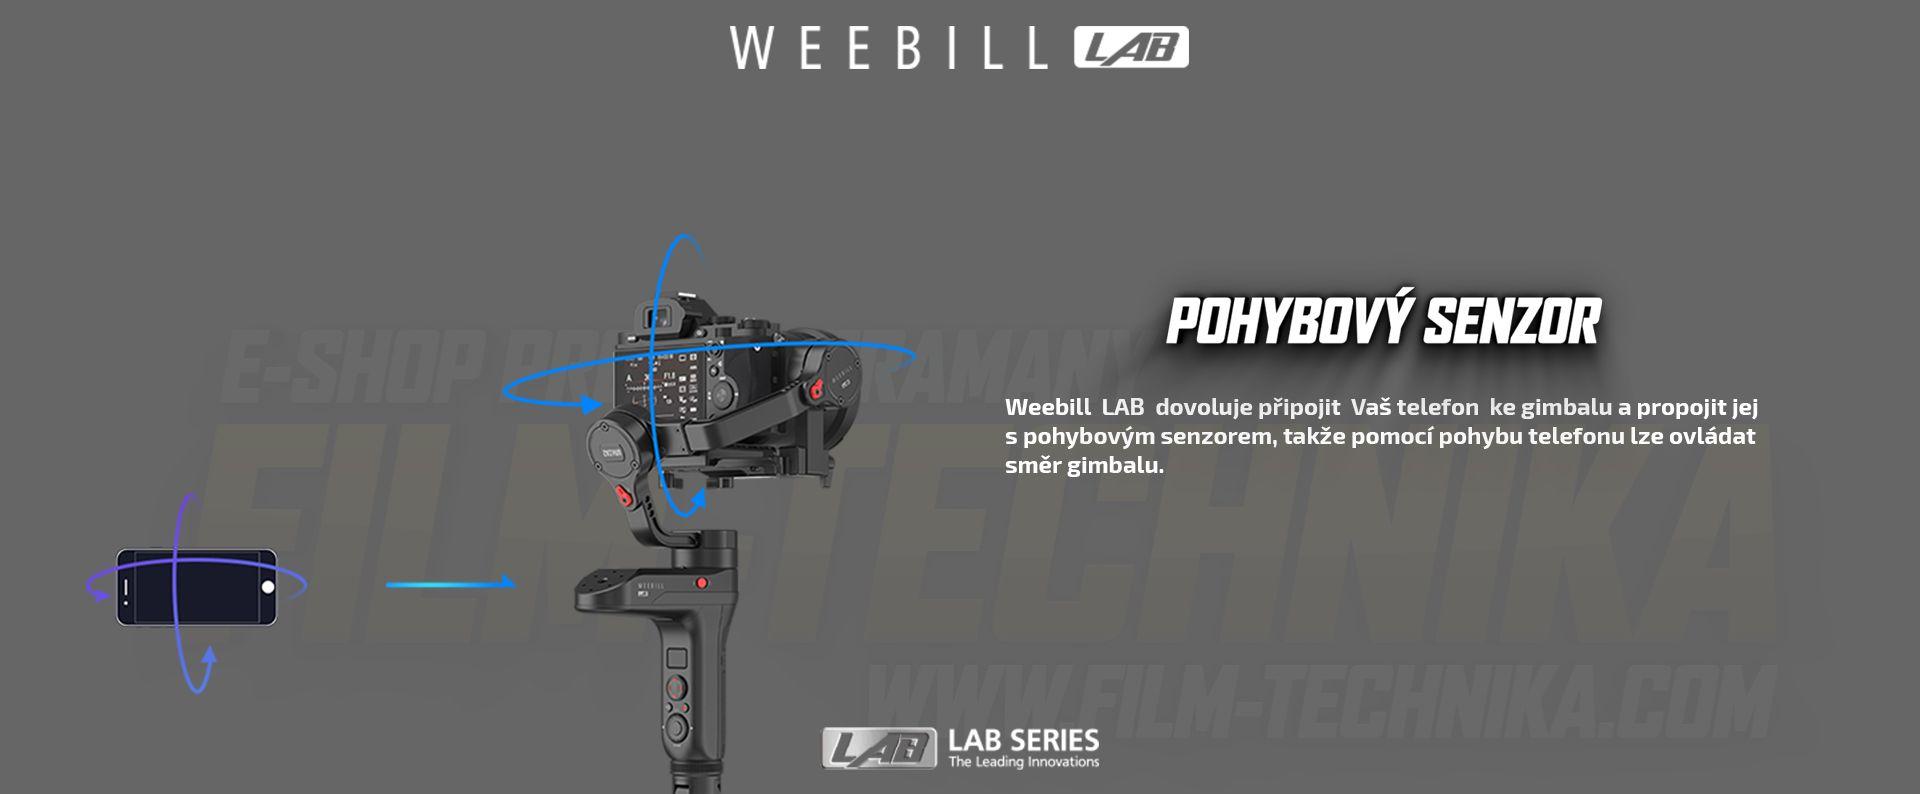 film-technika-zhiyun-weebill-lab-intext14